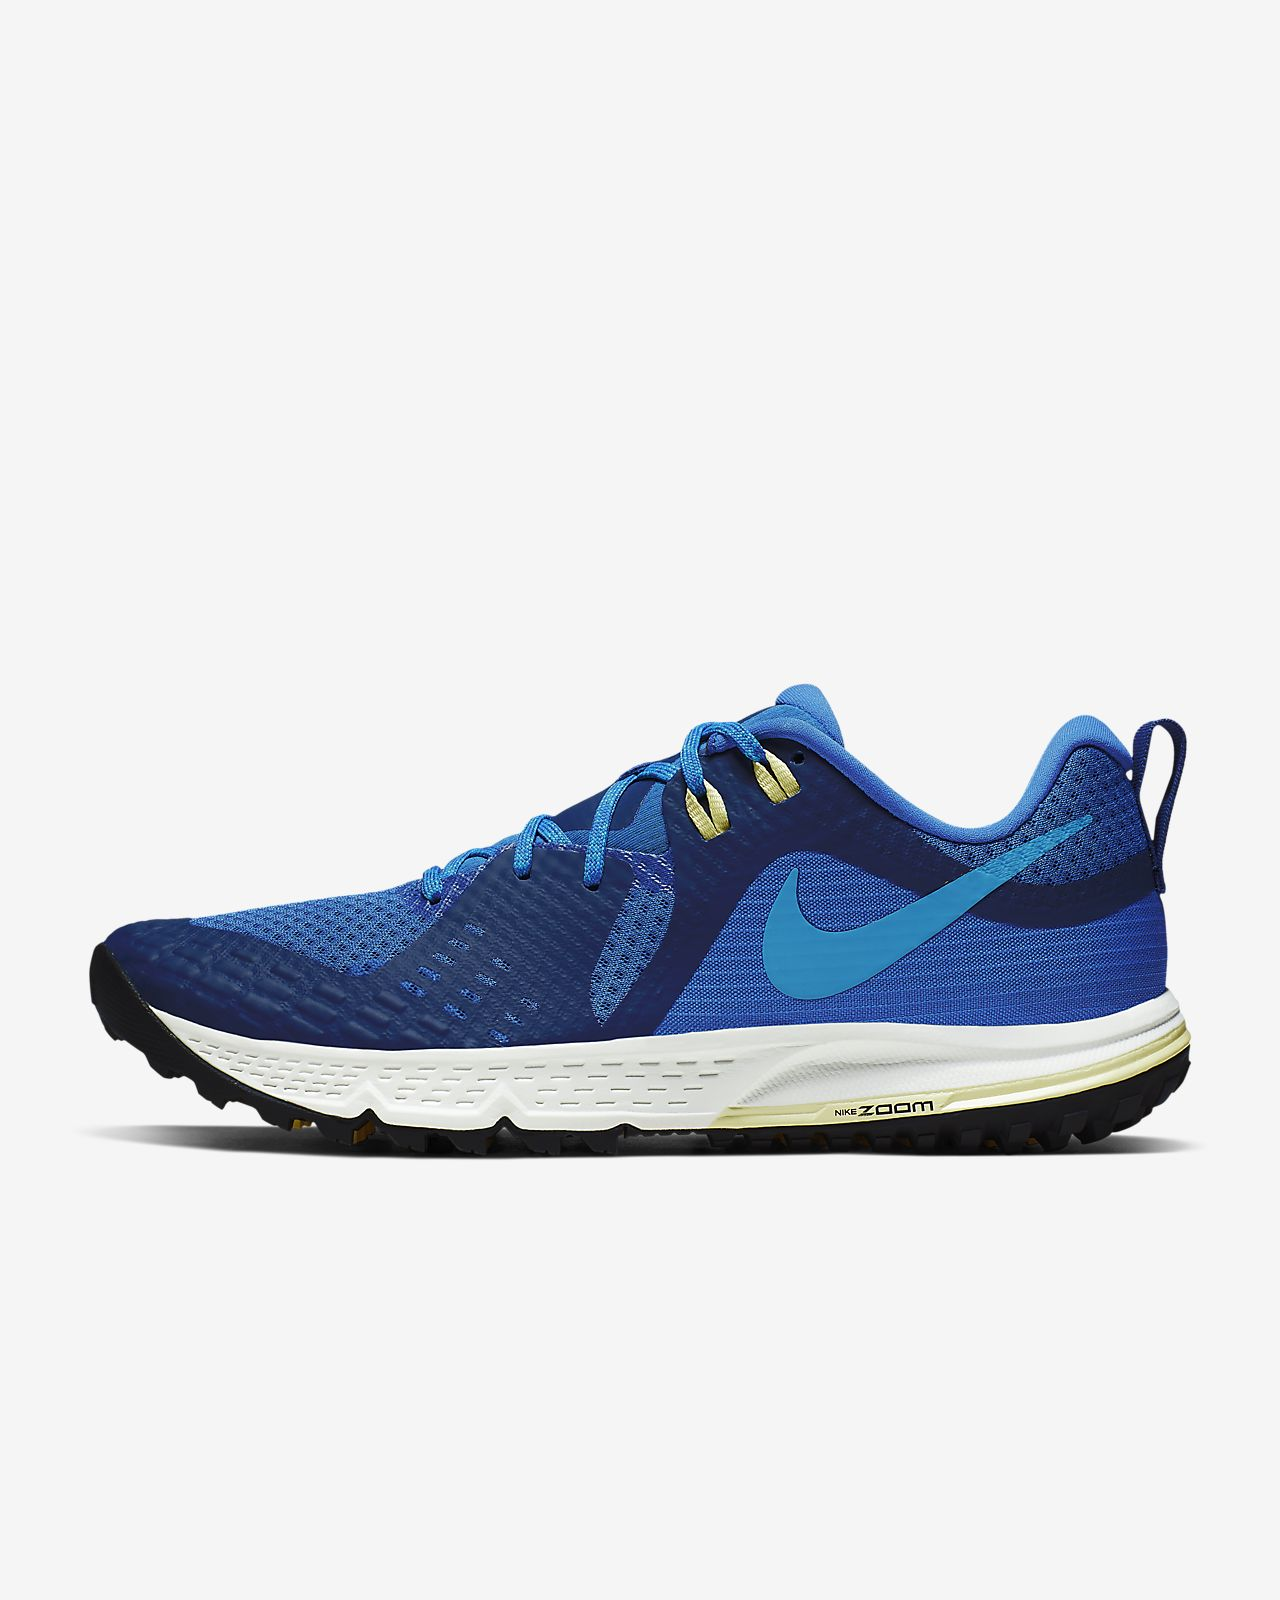 Scarpa da trail running Nike Air Zoom Wildhorse 5 - Uomo